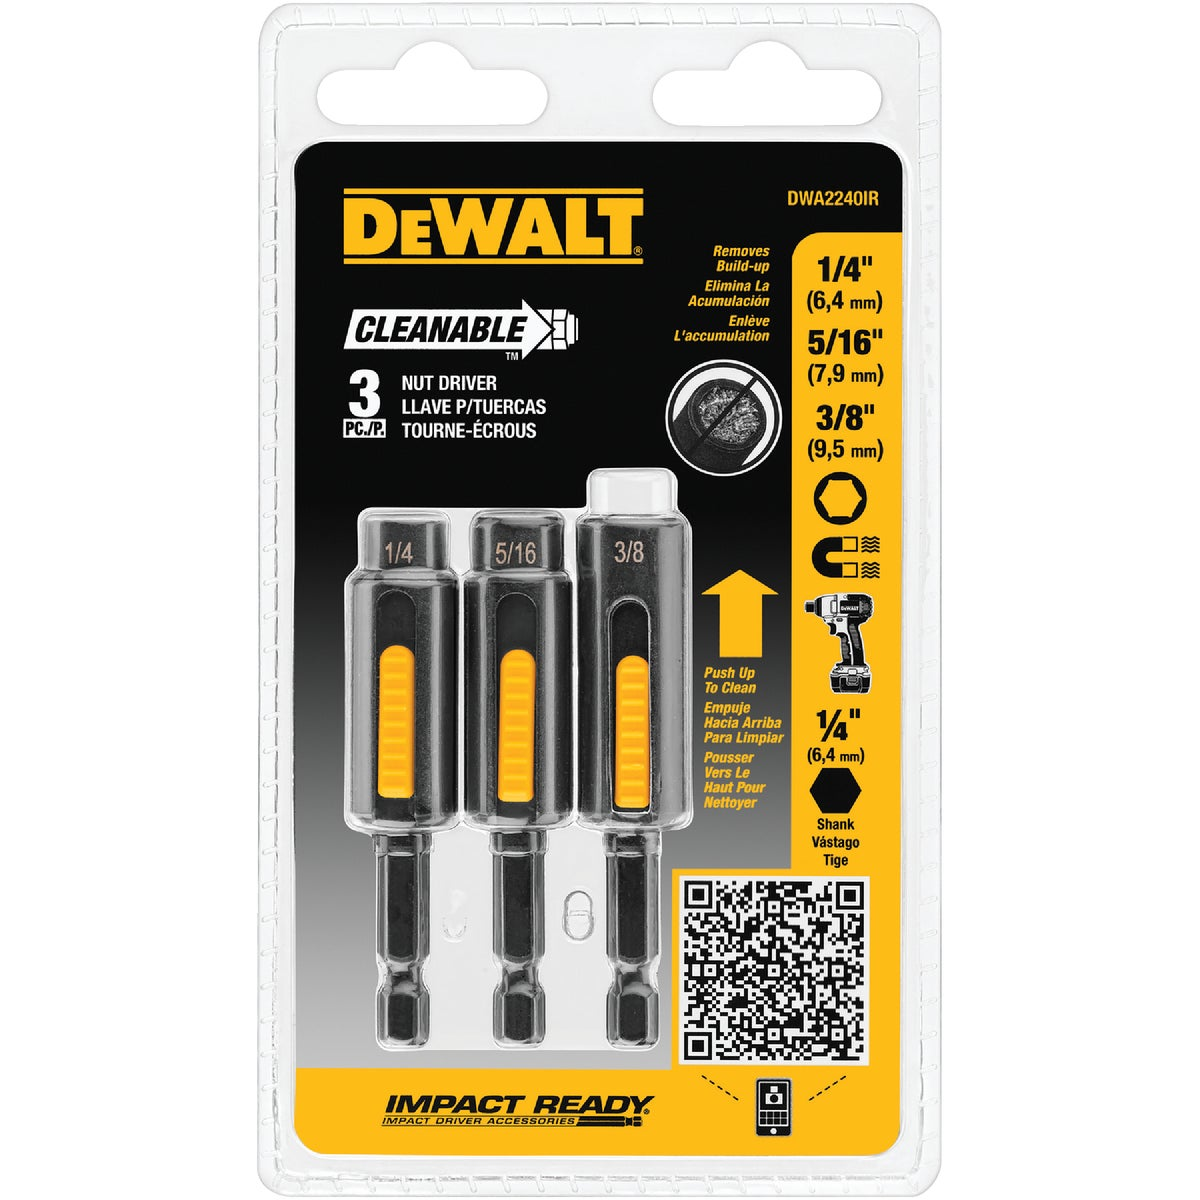 Black & Decker DeWalt Impact Ready 3-Piece Cleanable Magnetic Nutdriver Bit Set